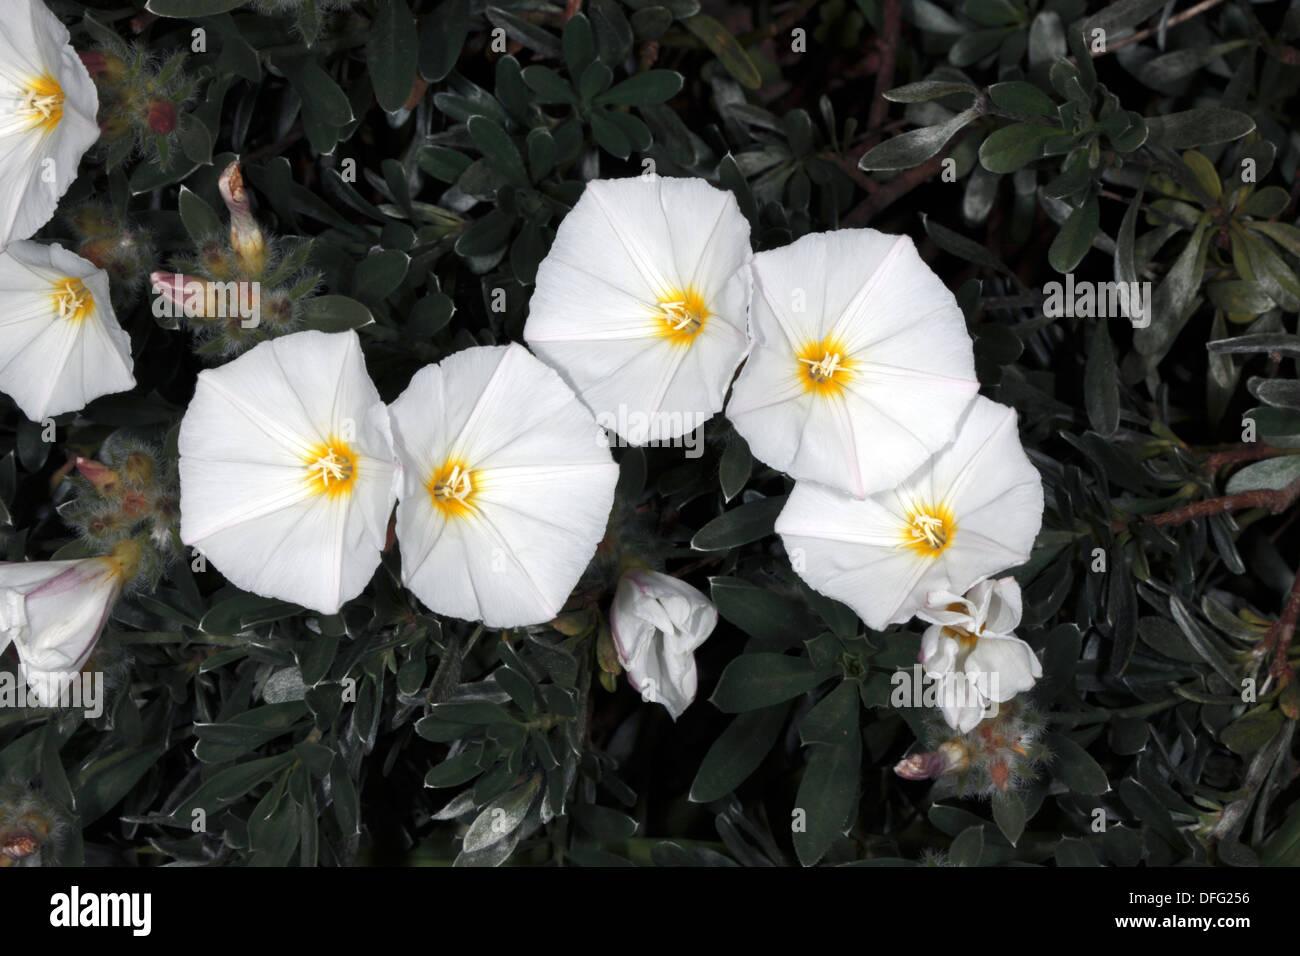 White Bindweed / False Bindweed / Morning Glory - Convolvulus - Family Convolvulaceae - Stock Image